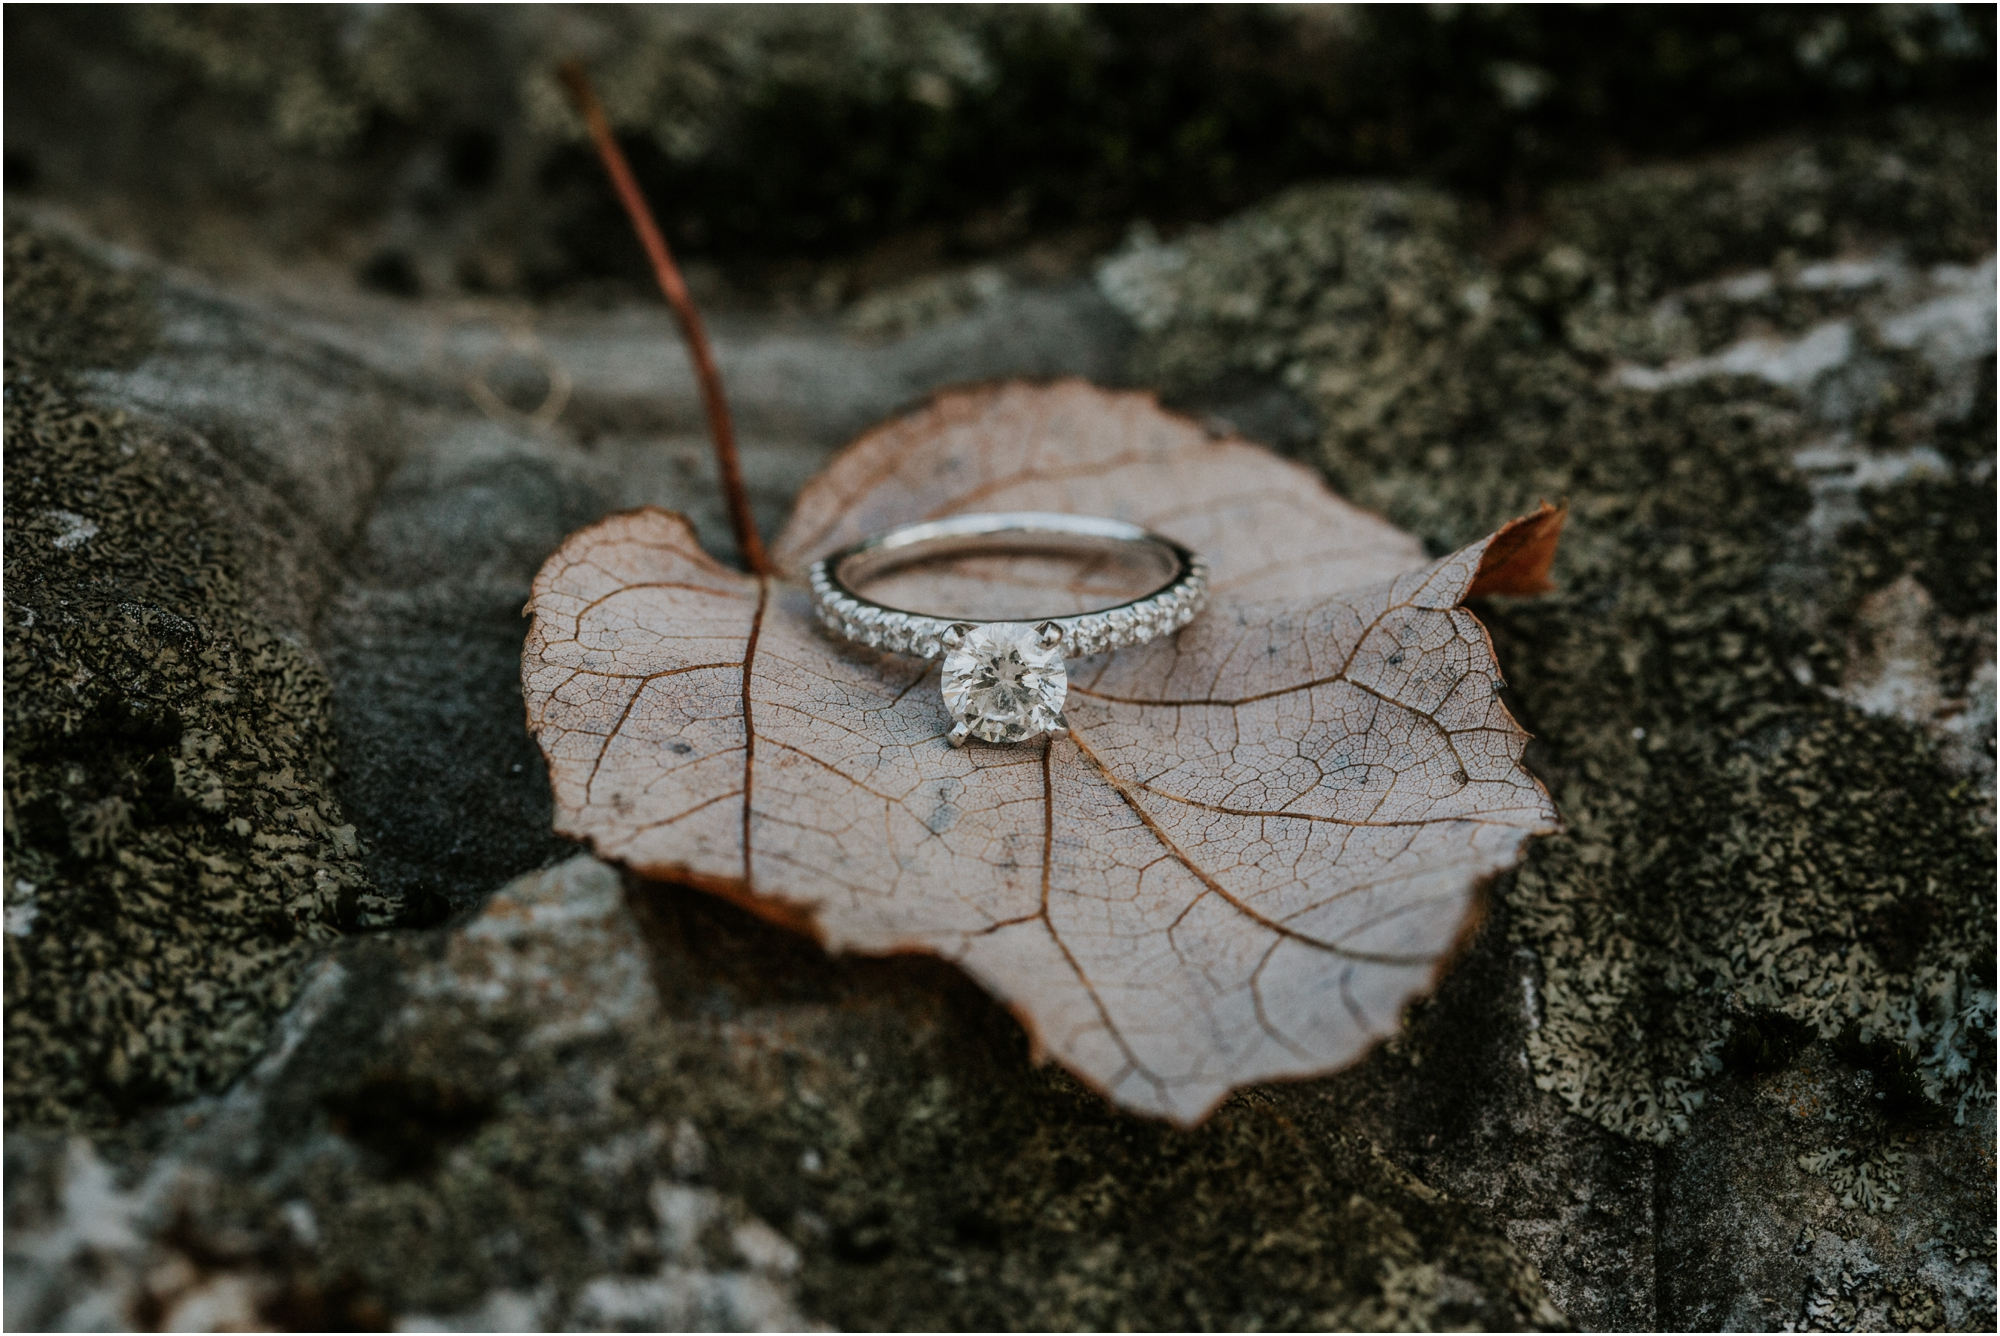 katy-sergent-millstone-limestone-tn-rustic-fall-engagement-session-adventurous-outdoors-intimate-elopement-wedding-northeast-johnson-city-photographer_0008.jpg